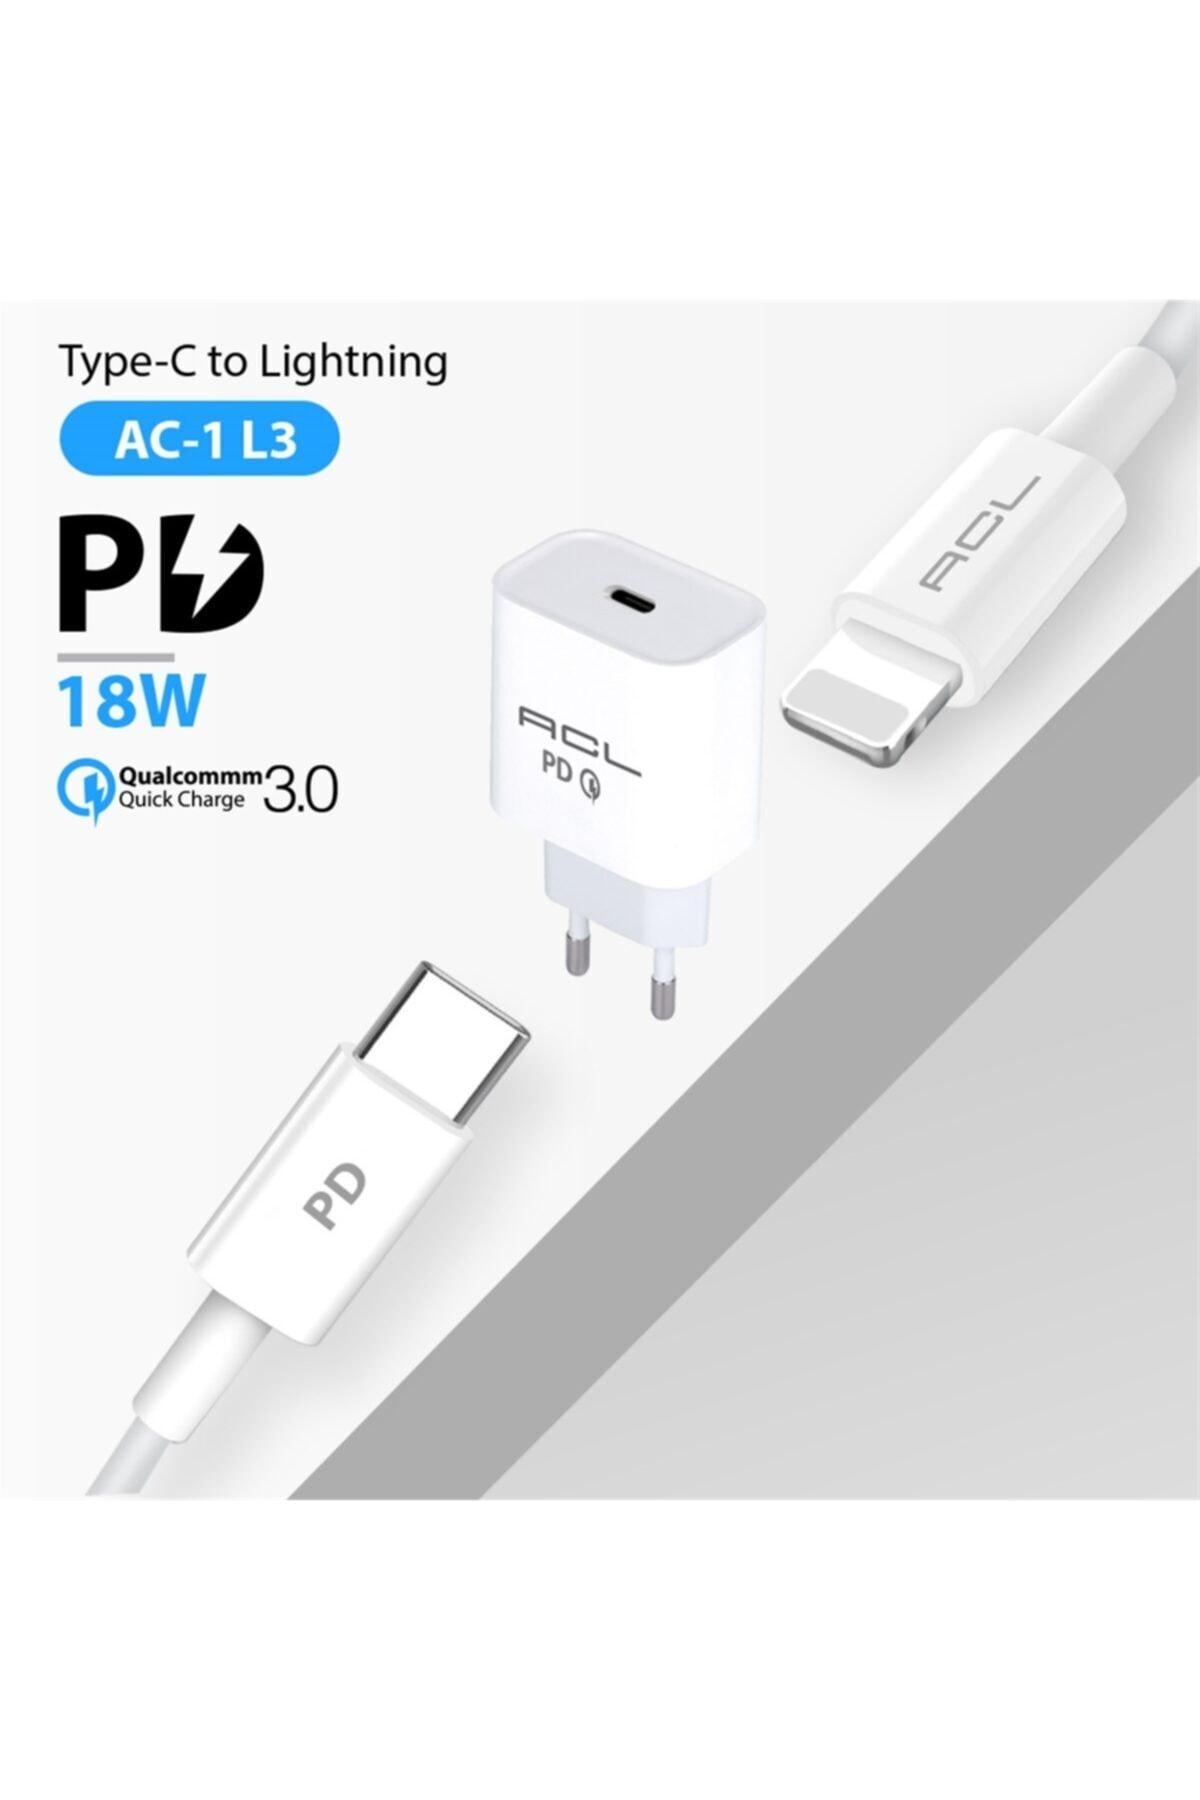 casemarkt Apple Yeni Nesil Type-c To Lightning Iphone & Ipad Pd Quick Charge 3a Duvar Şarj Aleti 2